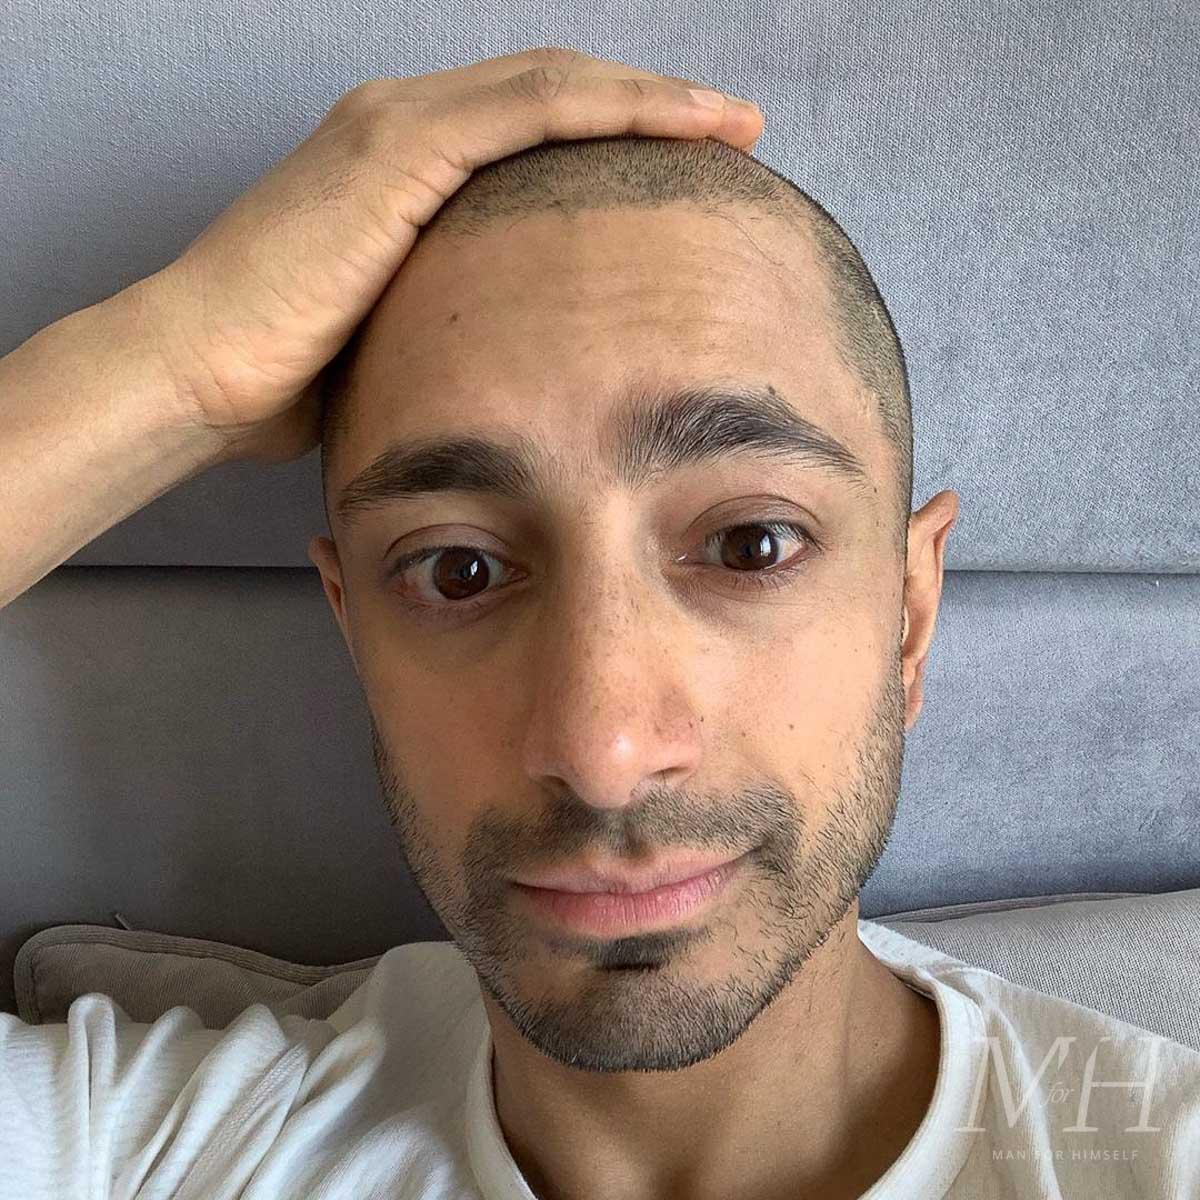 riz-ahmed-hair-shaved-head-lockdown-2020-buzzcut-man-for-himself